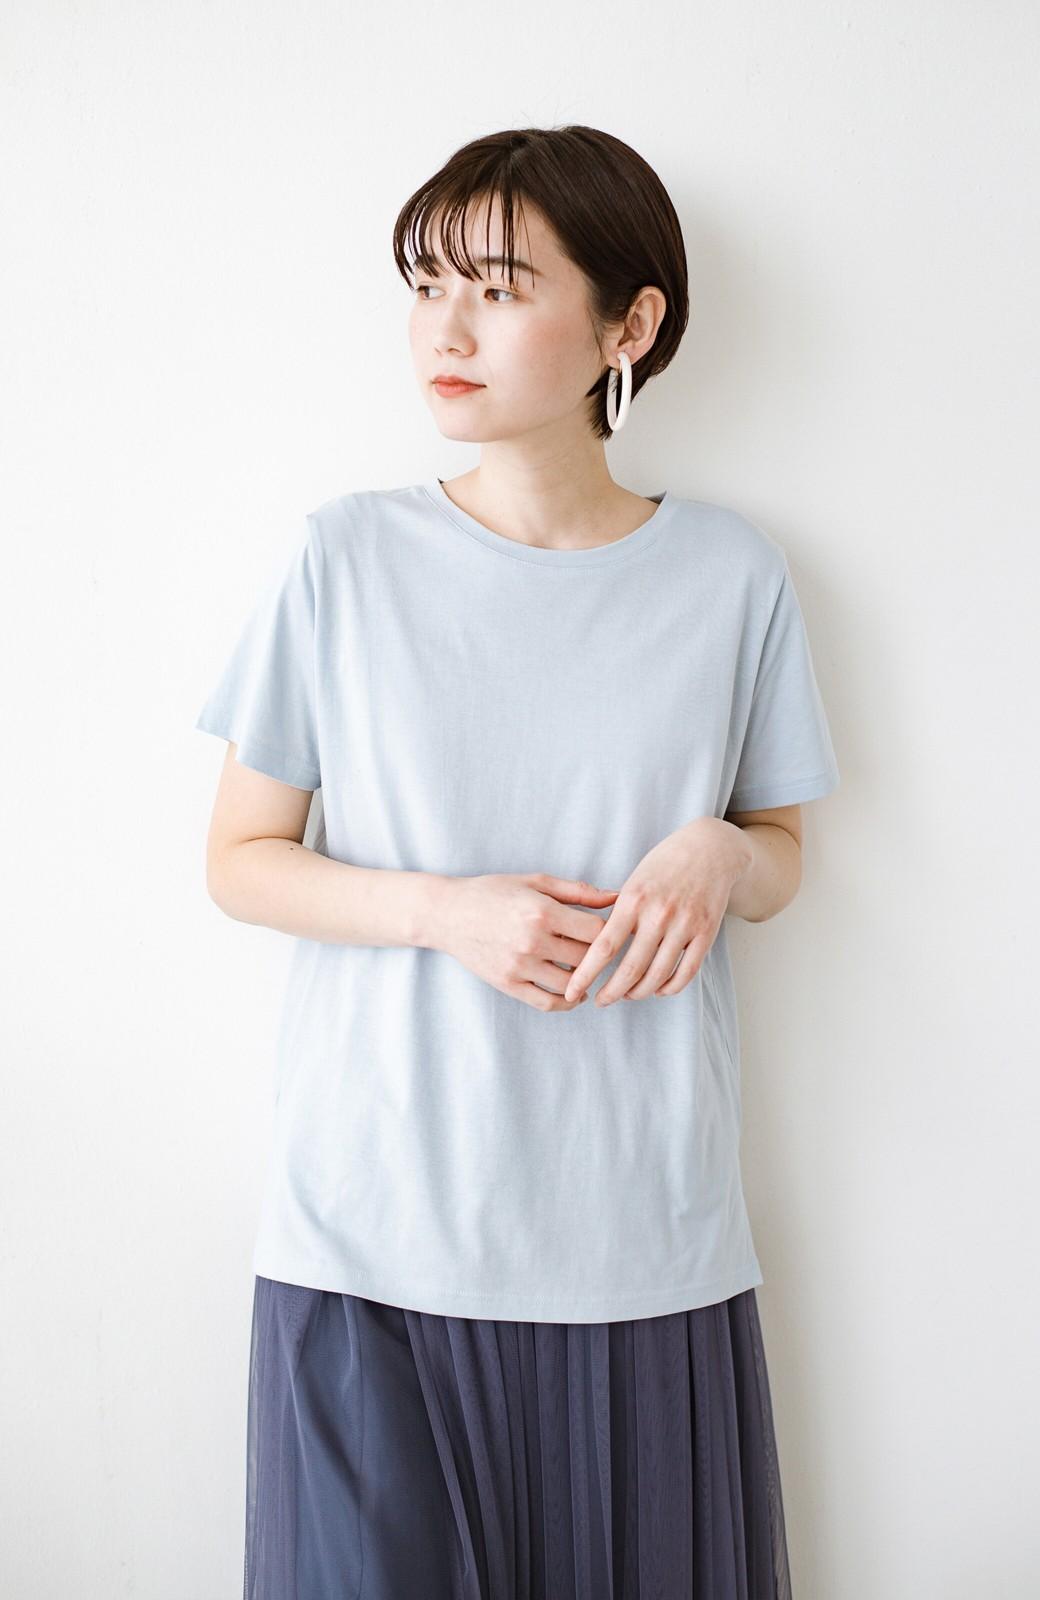 haco! 汗染み軽減加工で安心!1枚でも重ね着にも便利なシンプルTシャツ by ZAMPA <サックスブルー>の商品写真8